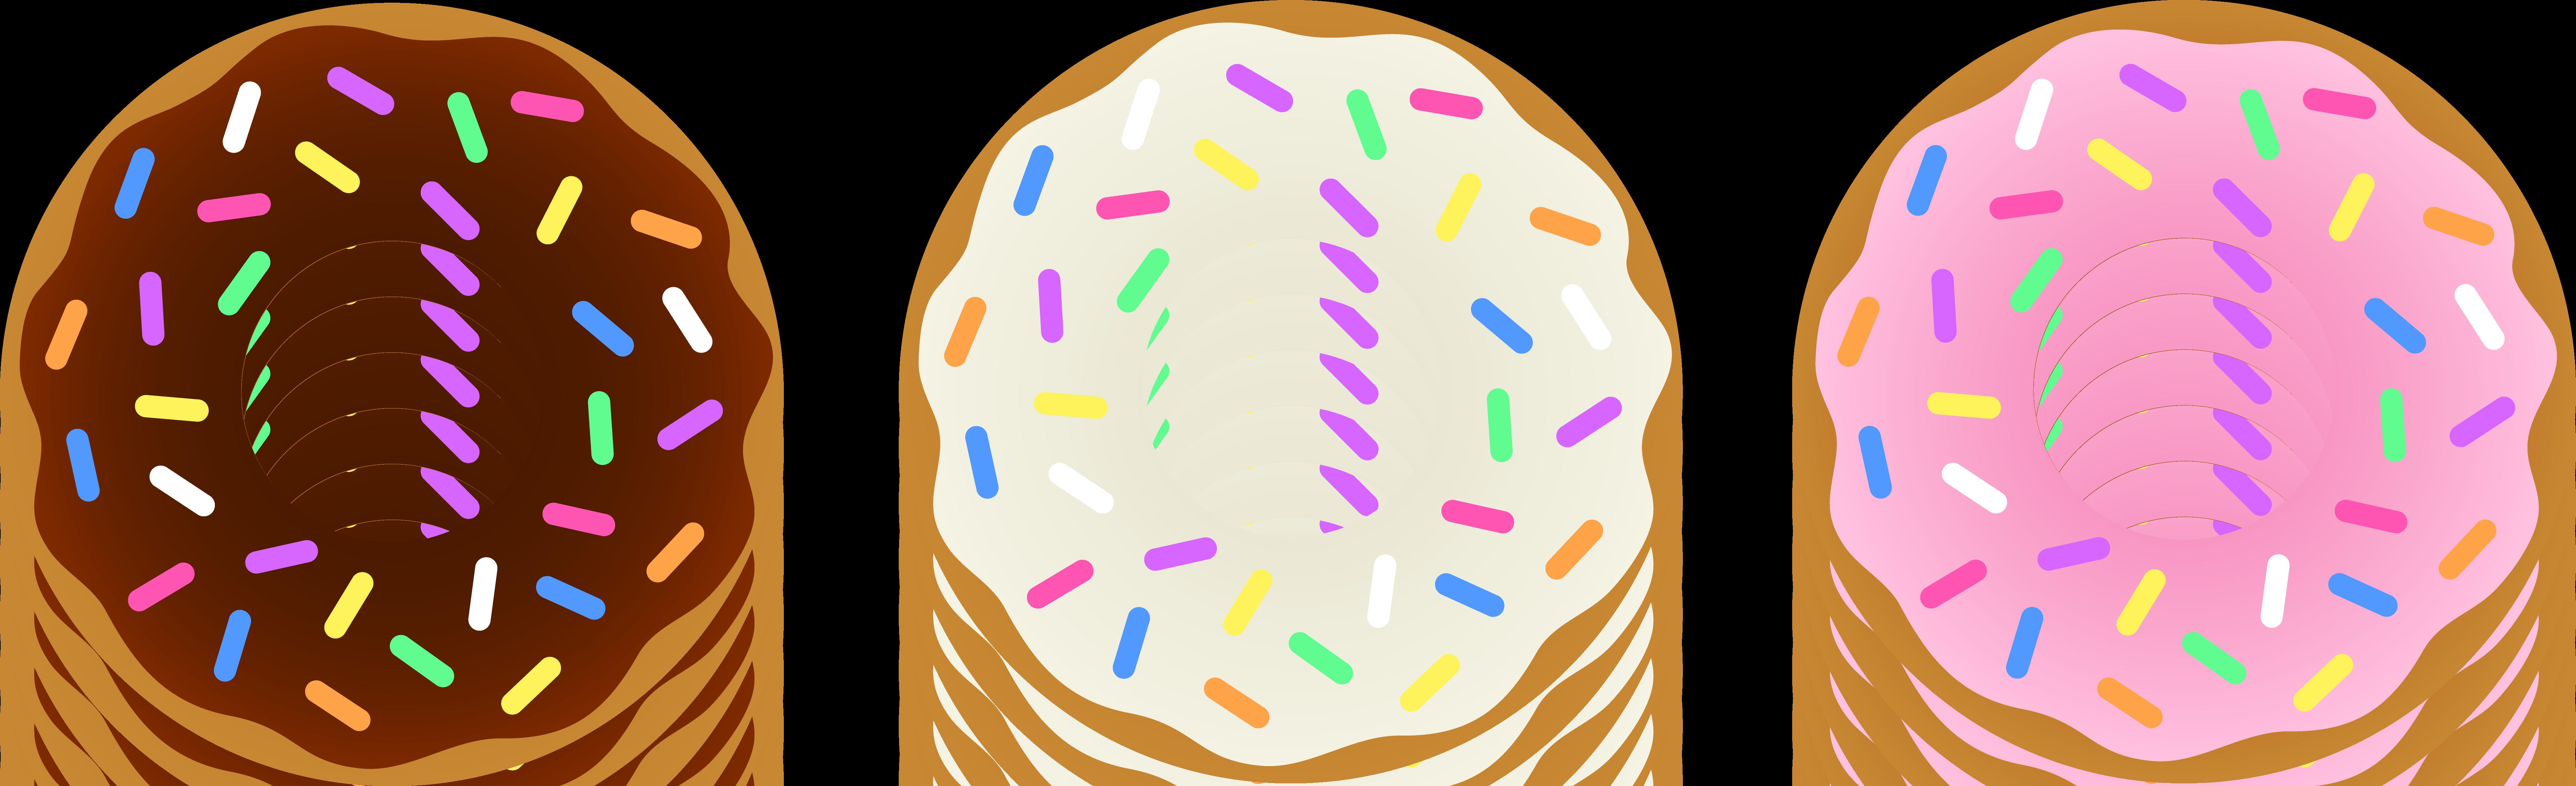 Question . Donut clipart logo